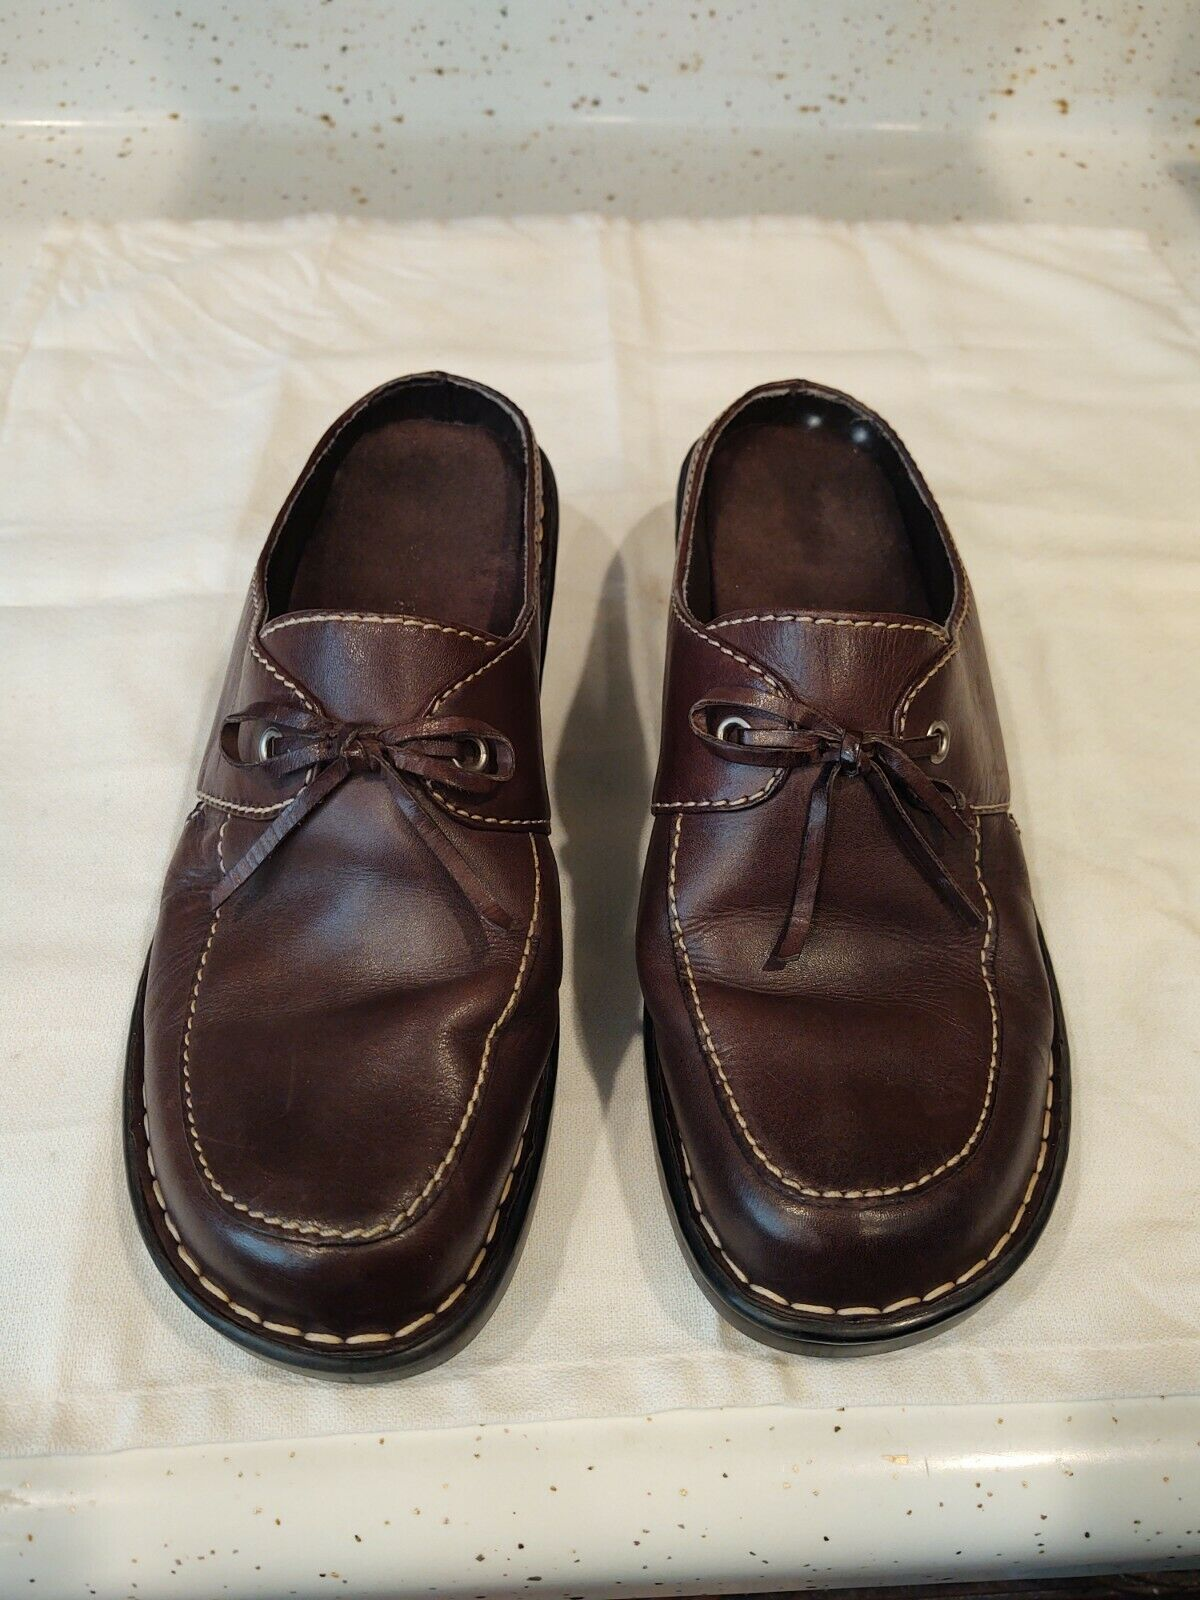 Eurostep Santa Ana Mule Clog Shoes Women's 9M Leather Upper